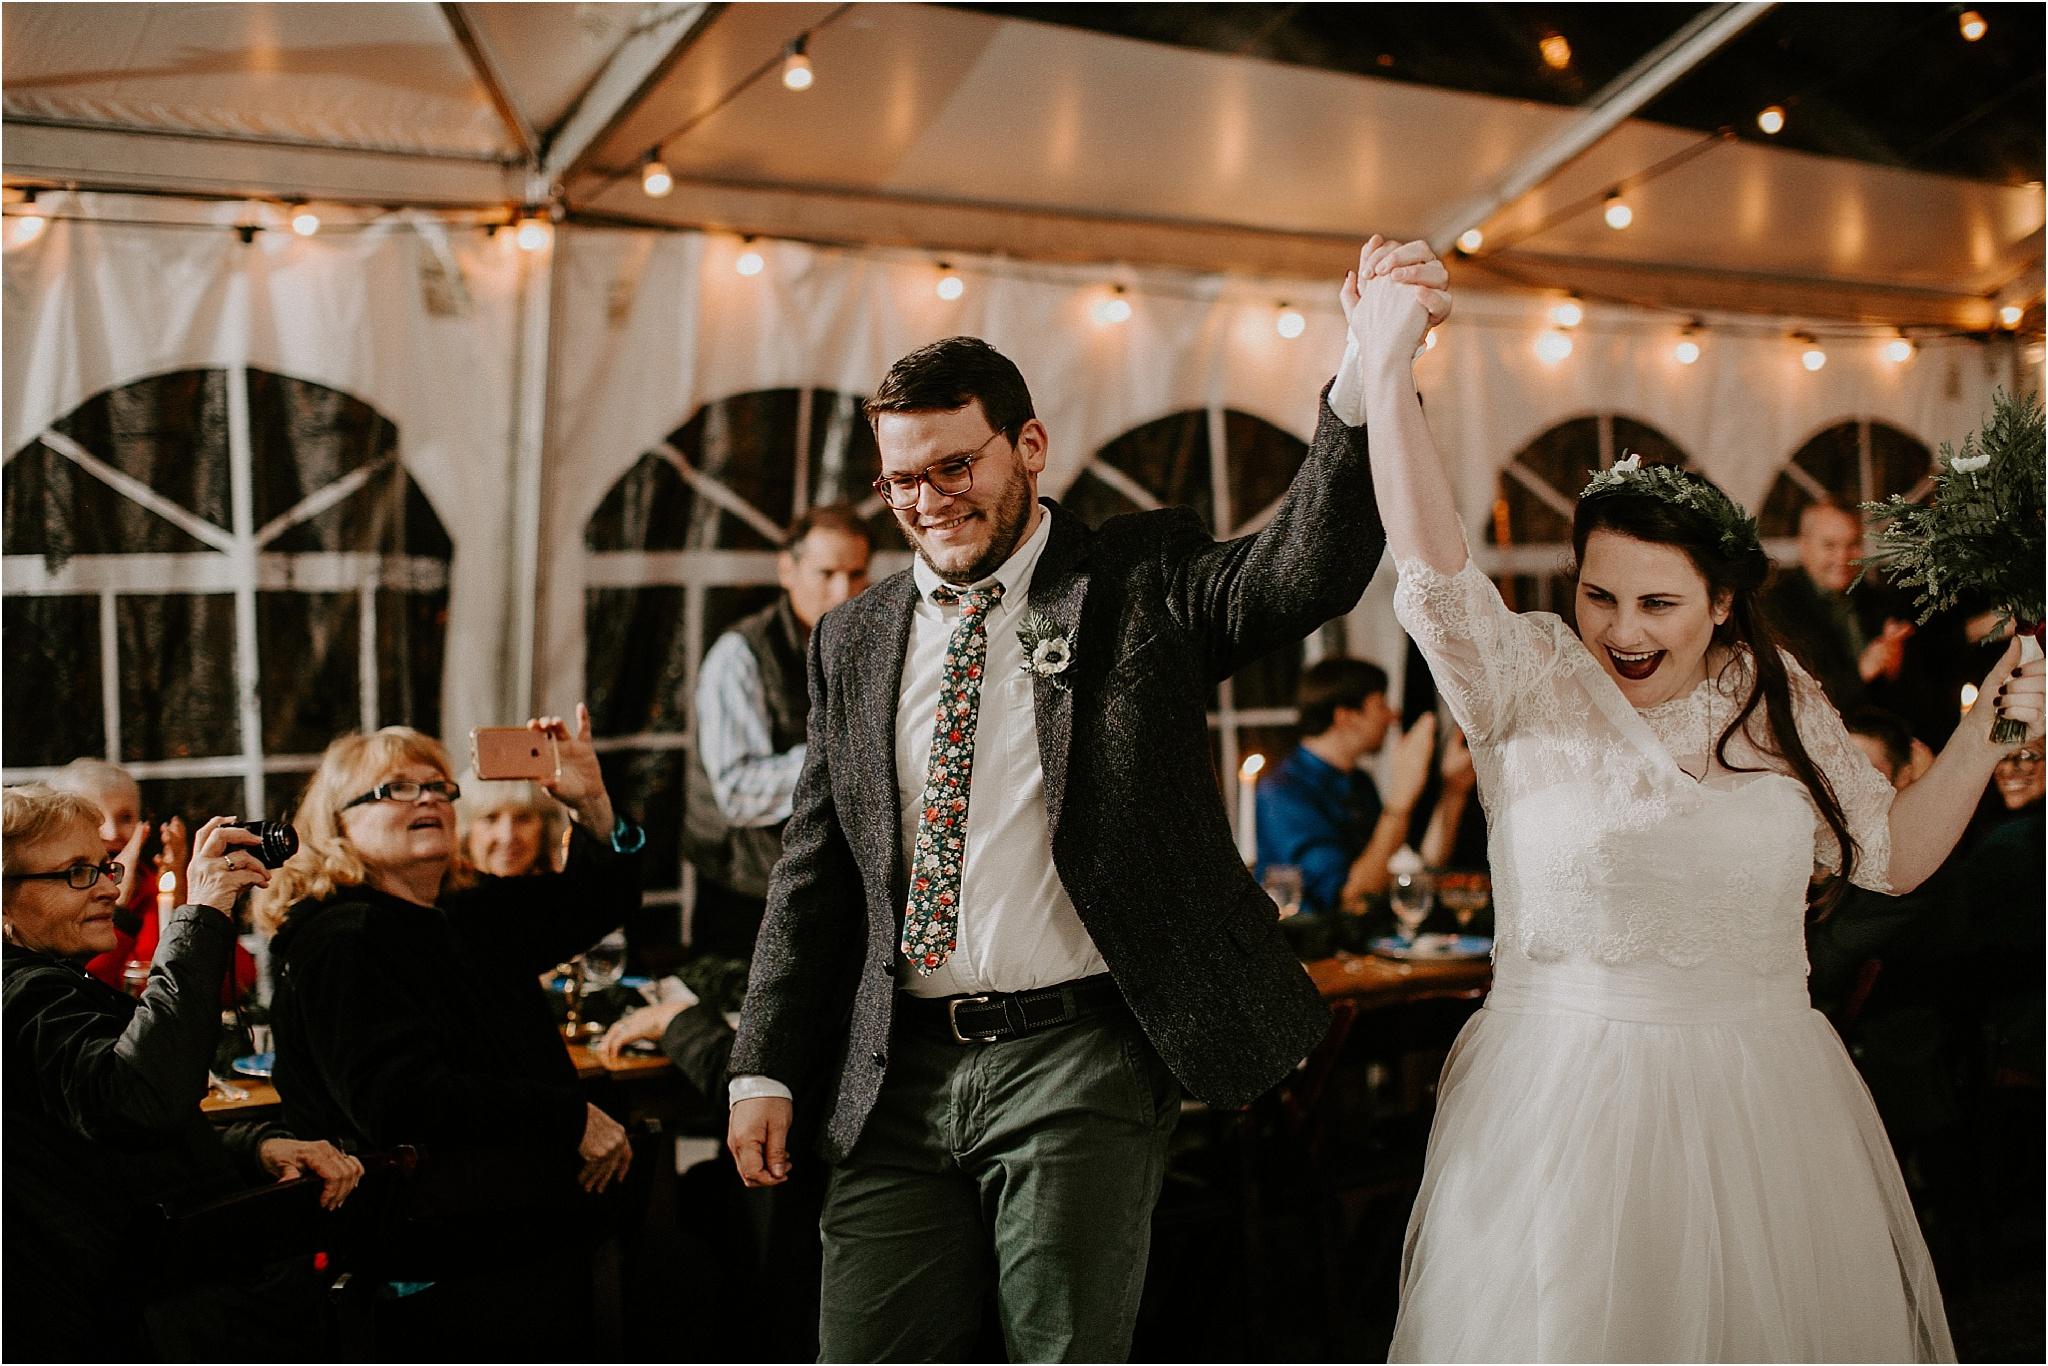 Sarah_Brookhart_Baltimore_Wedding_Photographer_0059.jpg